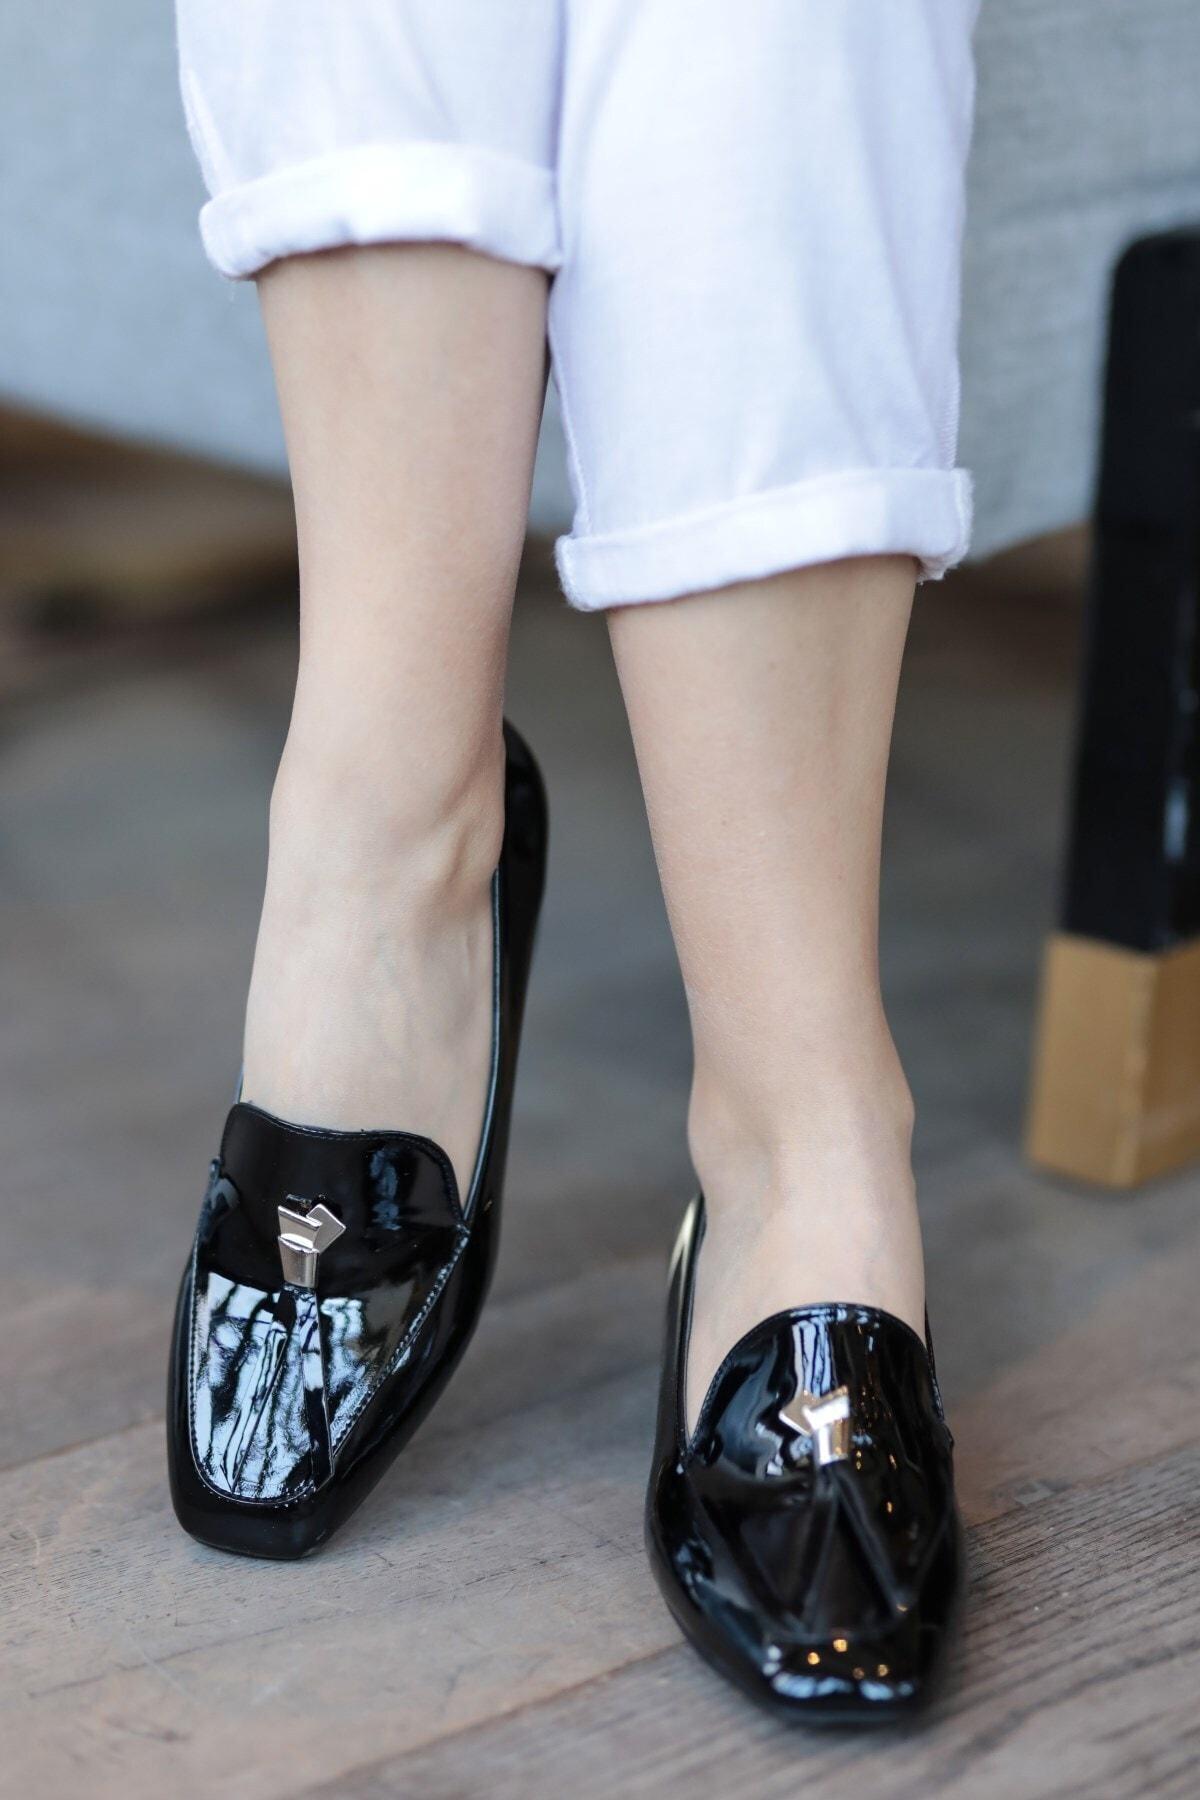 Angela Siyah Rugan Topuklu Ayakkabı